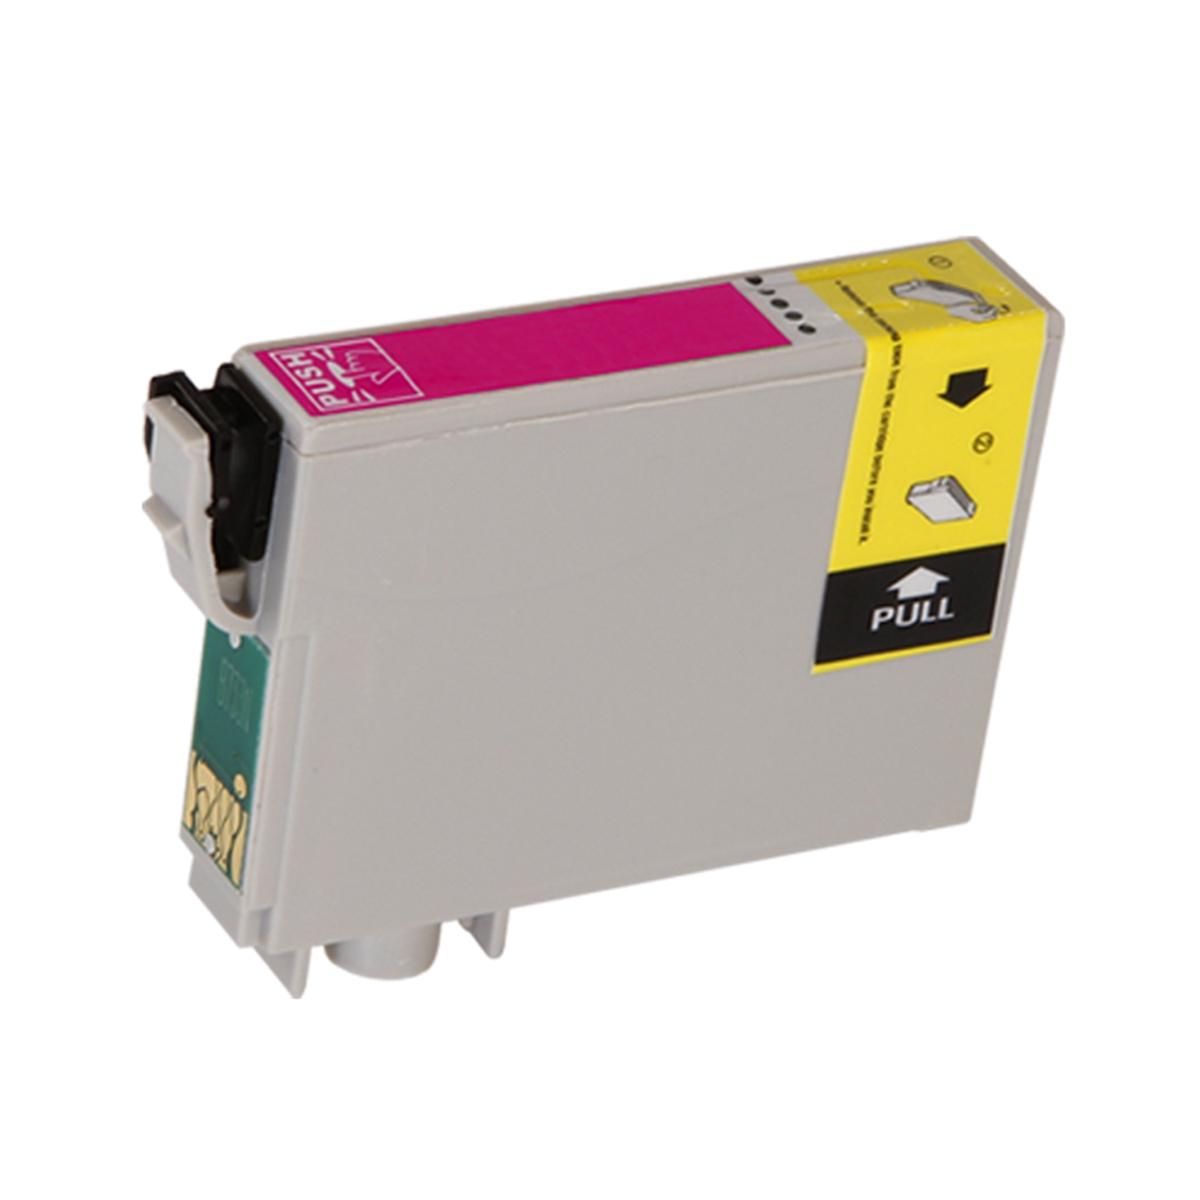 Cartucho Compatível Novo Para Impressora Jato De Tinta Epson Stylus C 67/ C 87/ Cx 3700/ Cx 4100/ Cx 4700 Magenta  Menno Gráfica